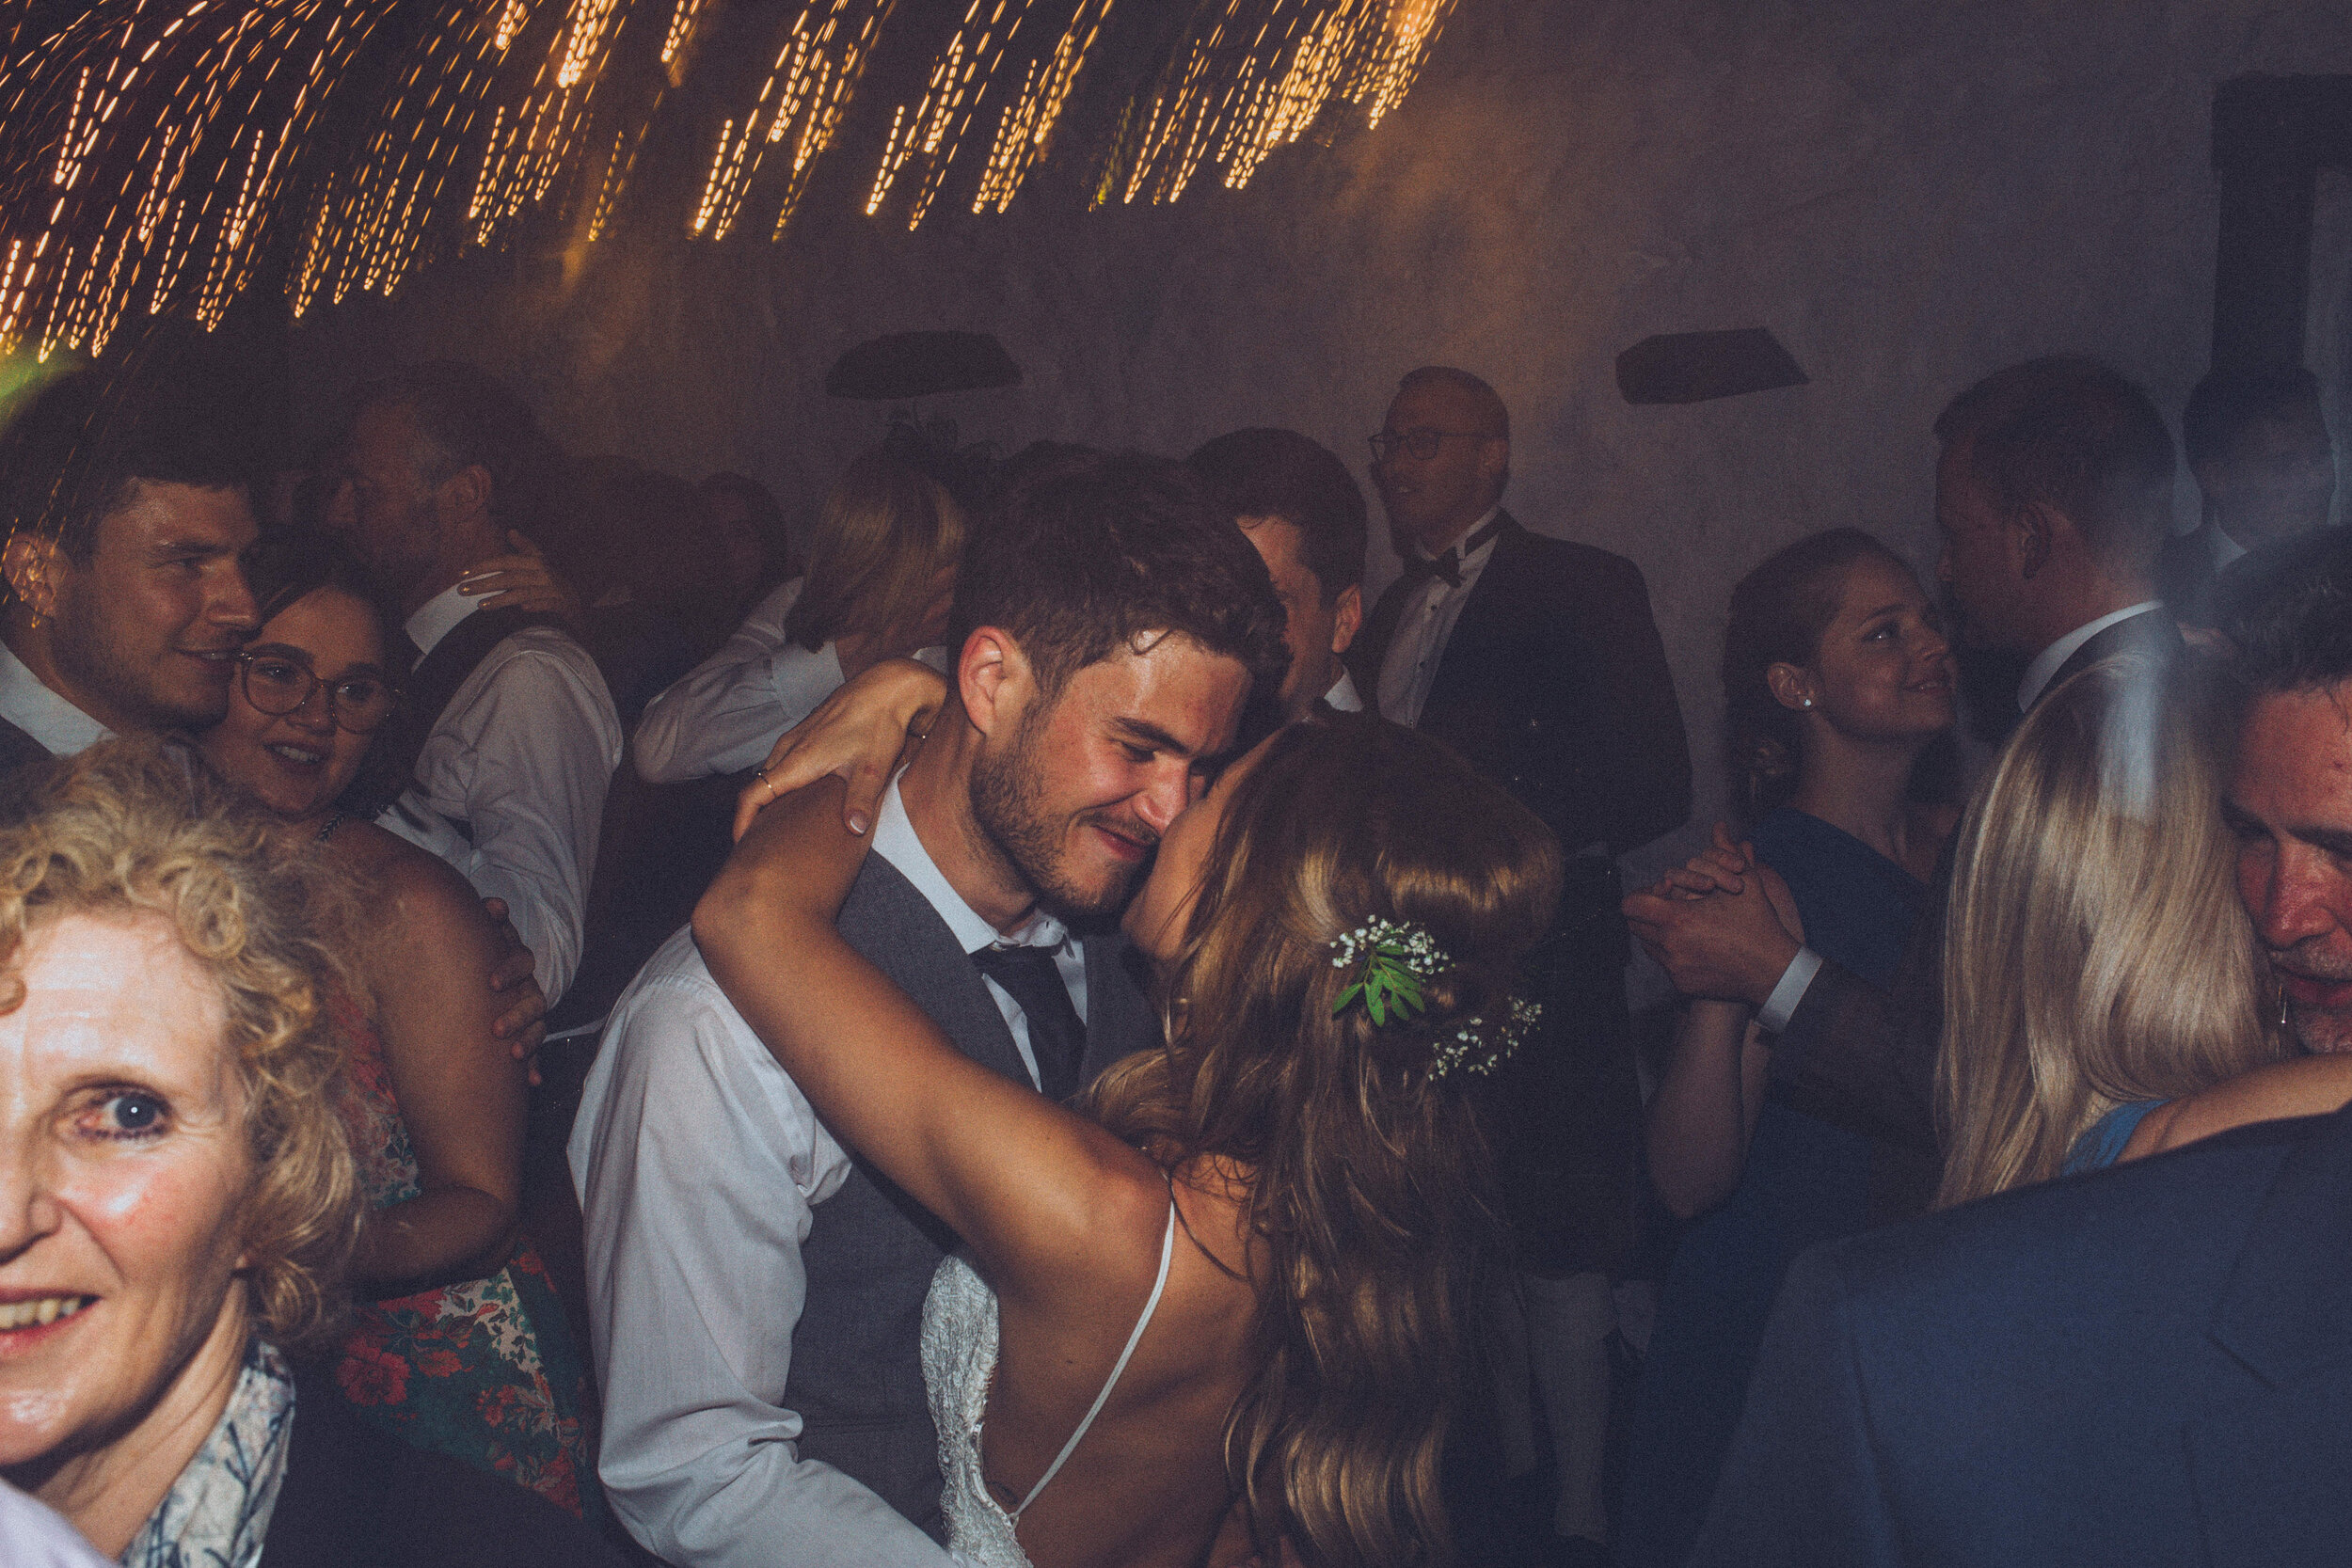 Dalduff Farm Ayrshire Wedding Photography - Claire Basiuk Photographer - 28.jpg